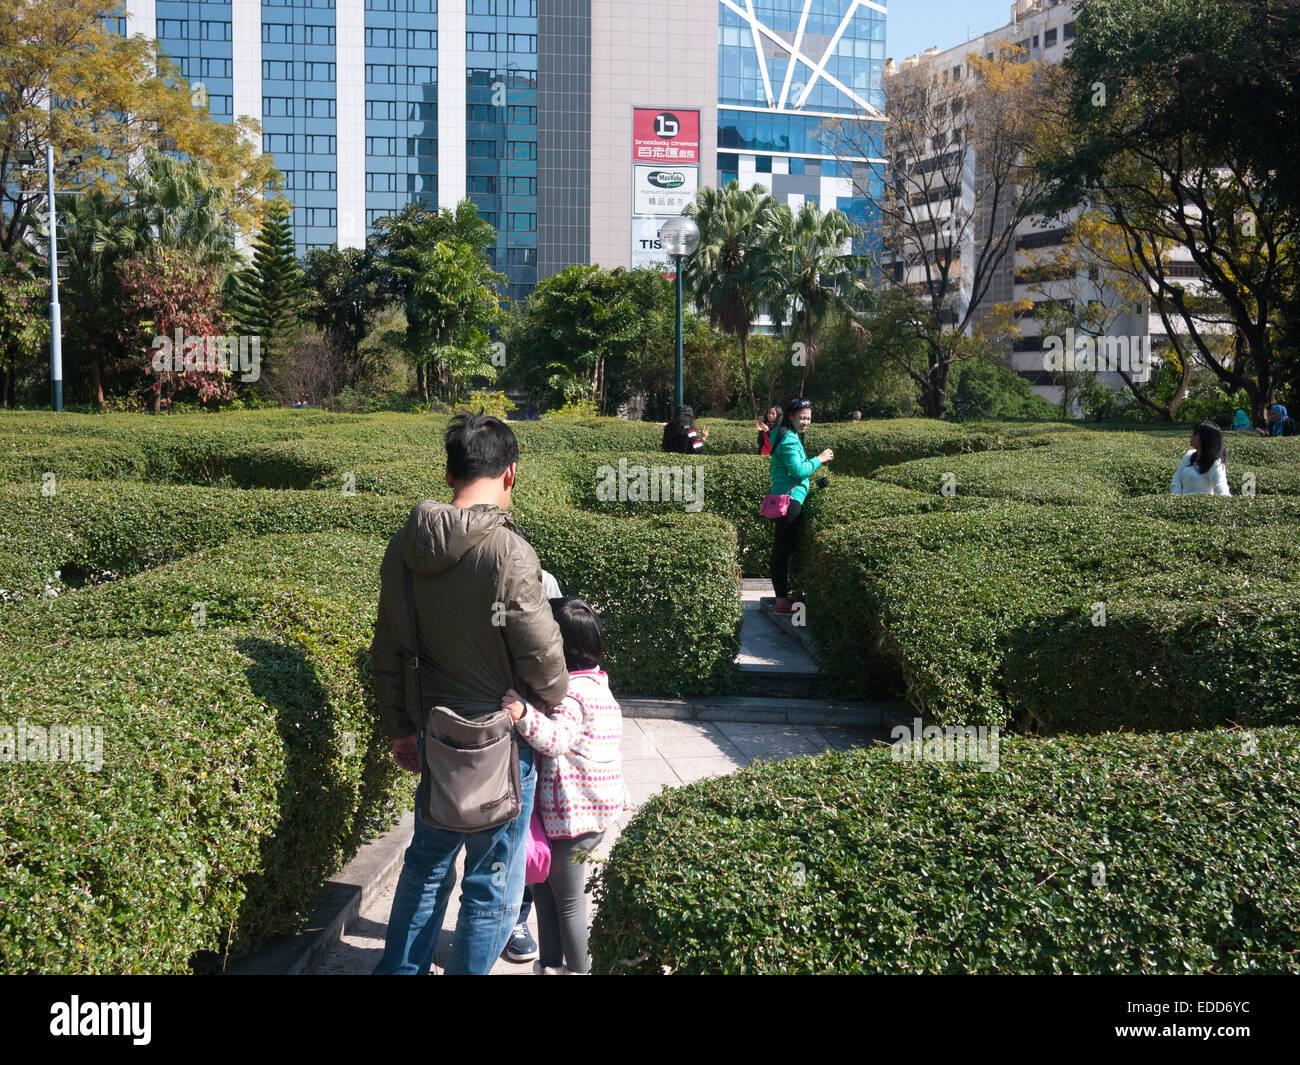 Hong Kong - Maze in Kowloon Park - Stock Image